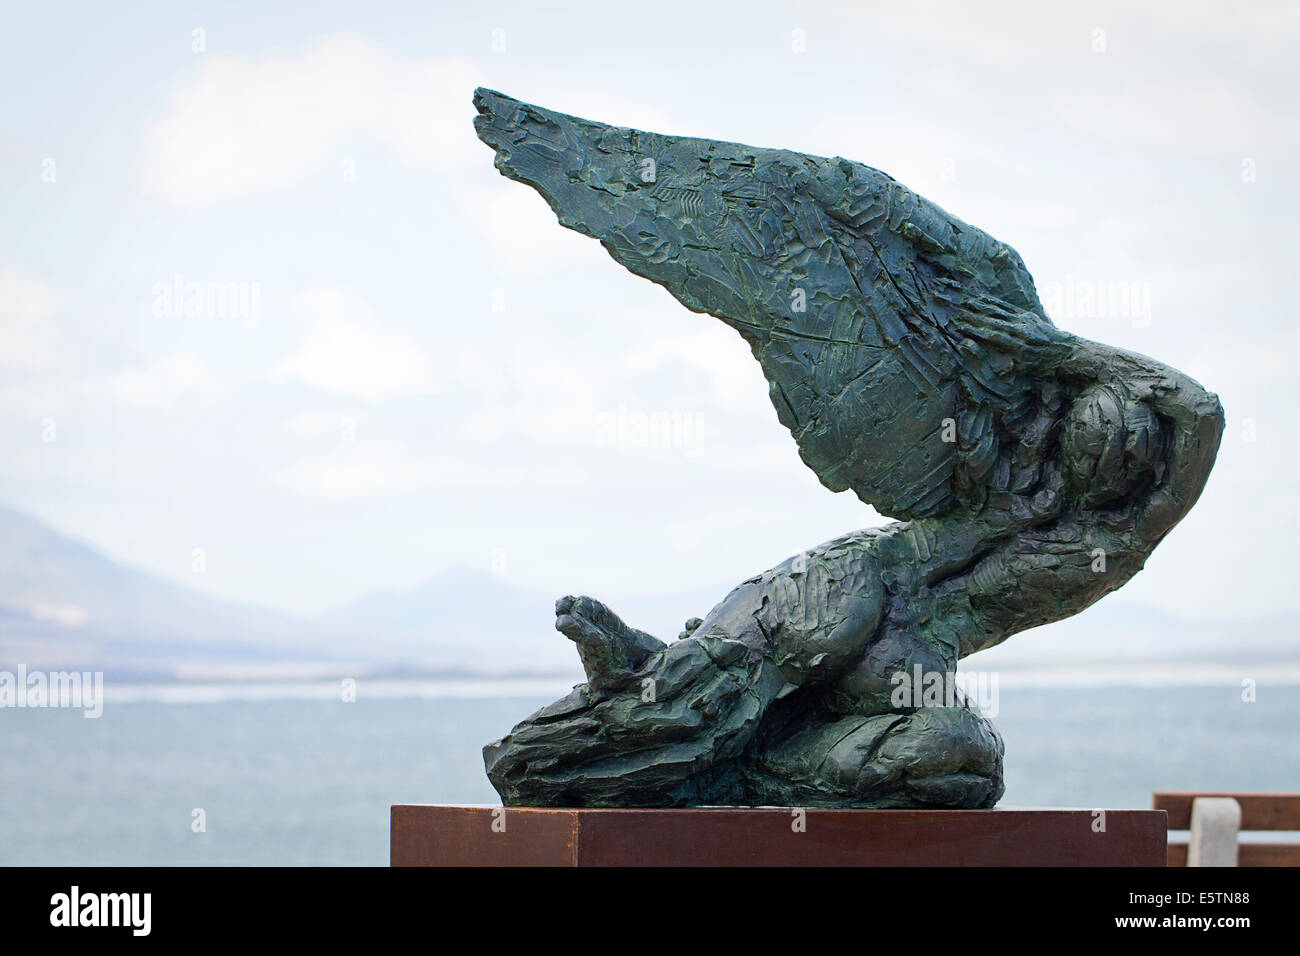 Bronze angel sculpture, Hermanus, South Africa - Stock Image